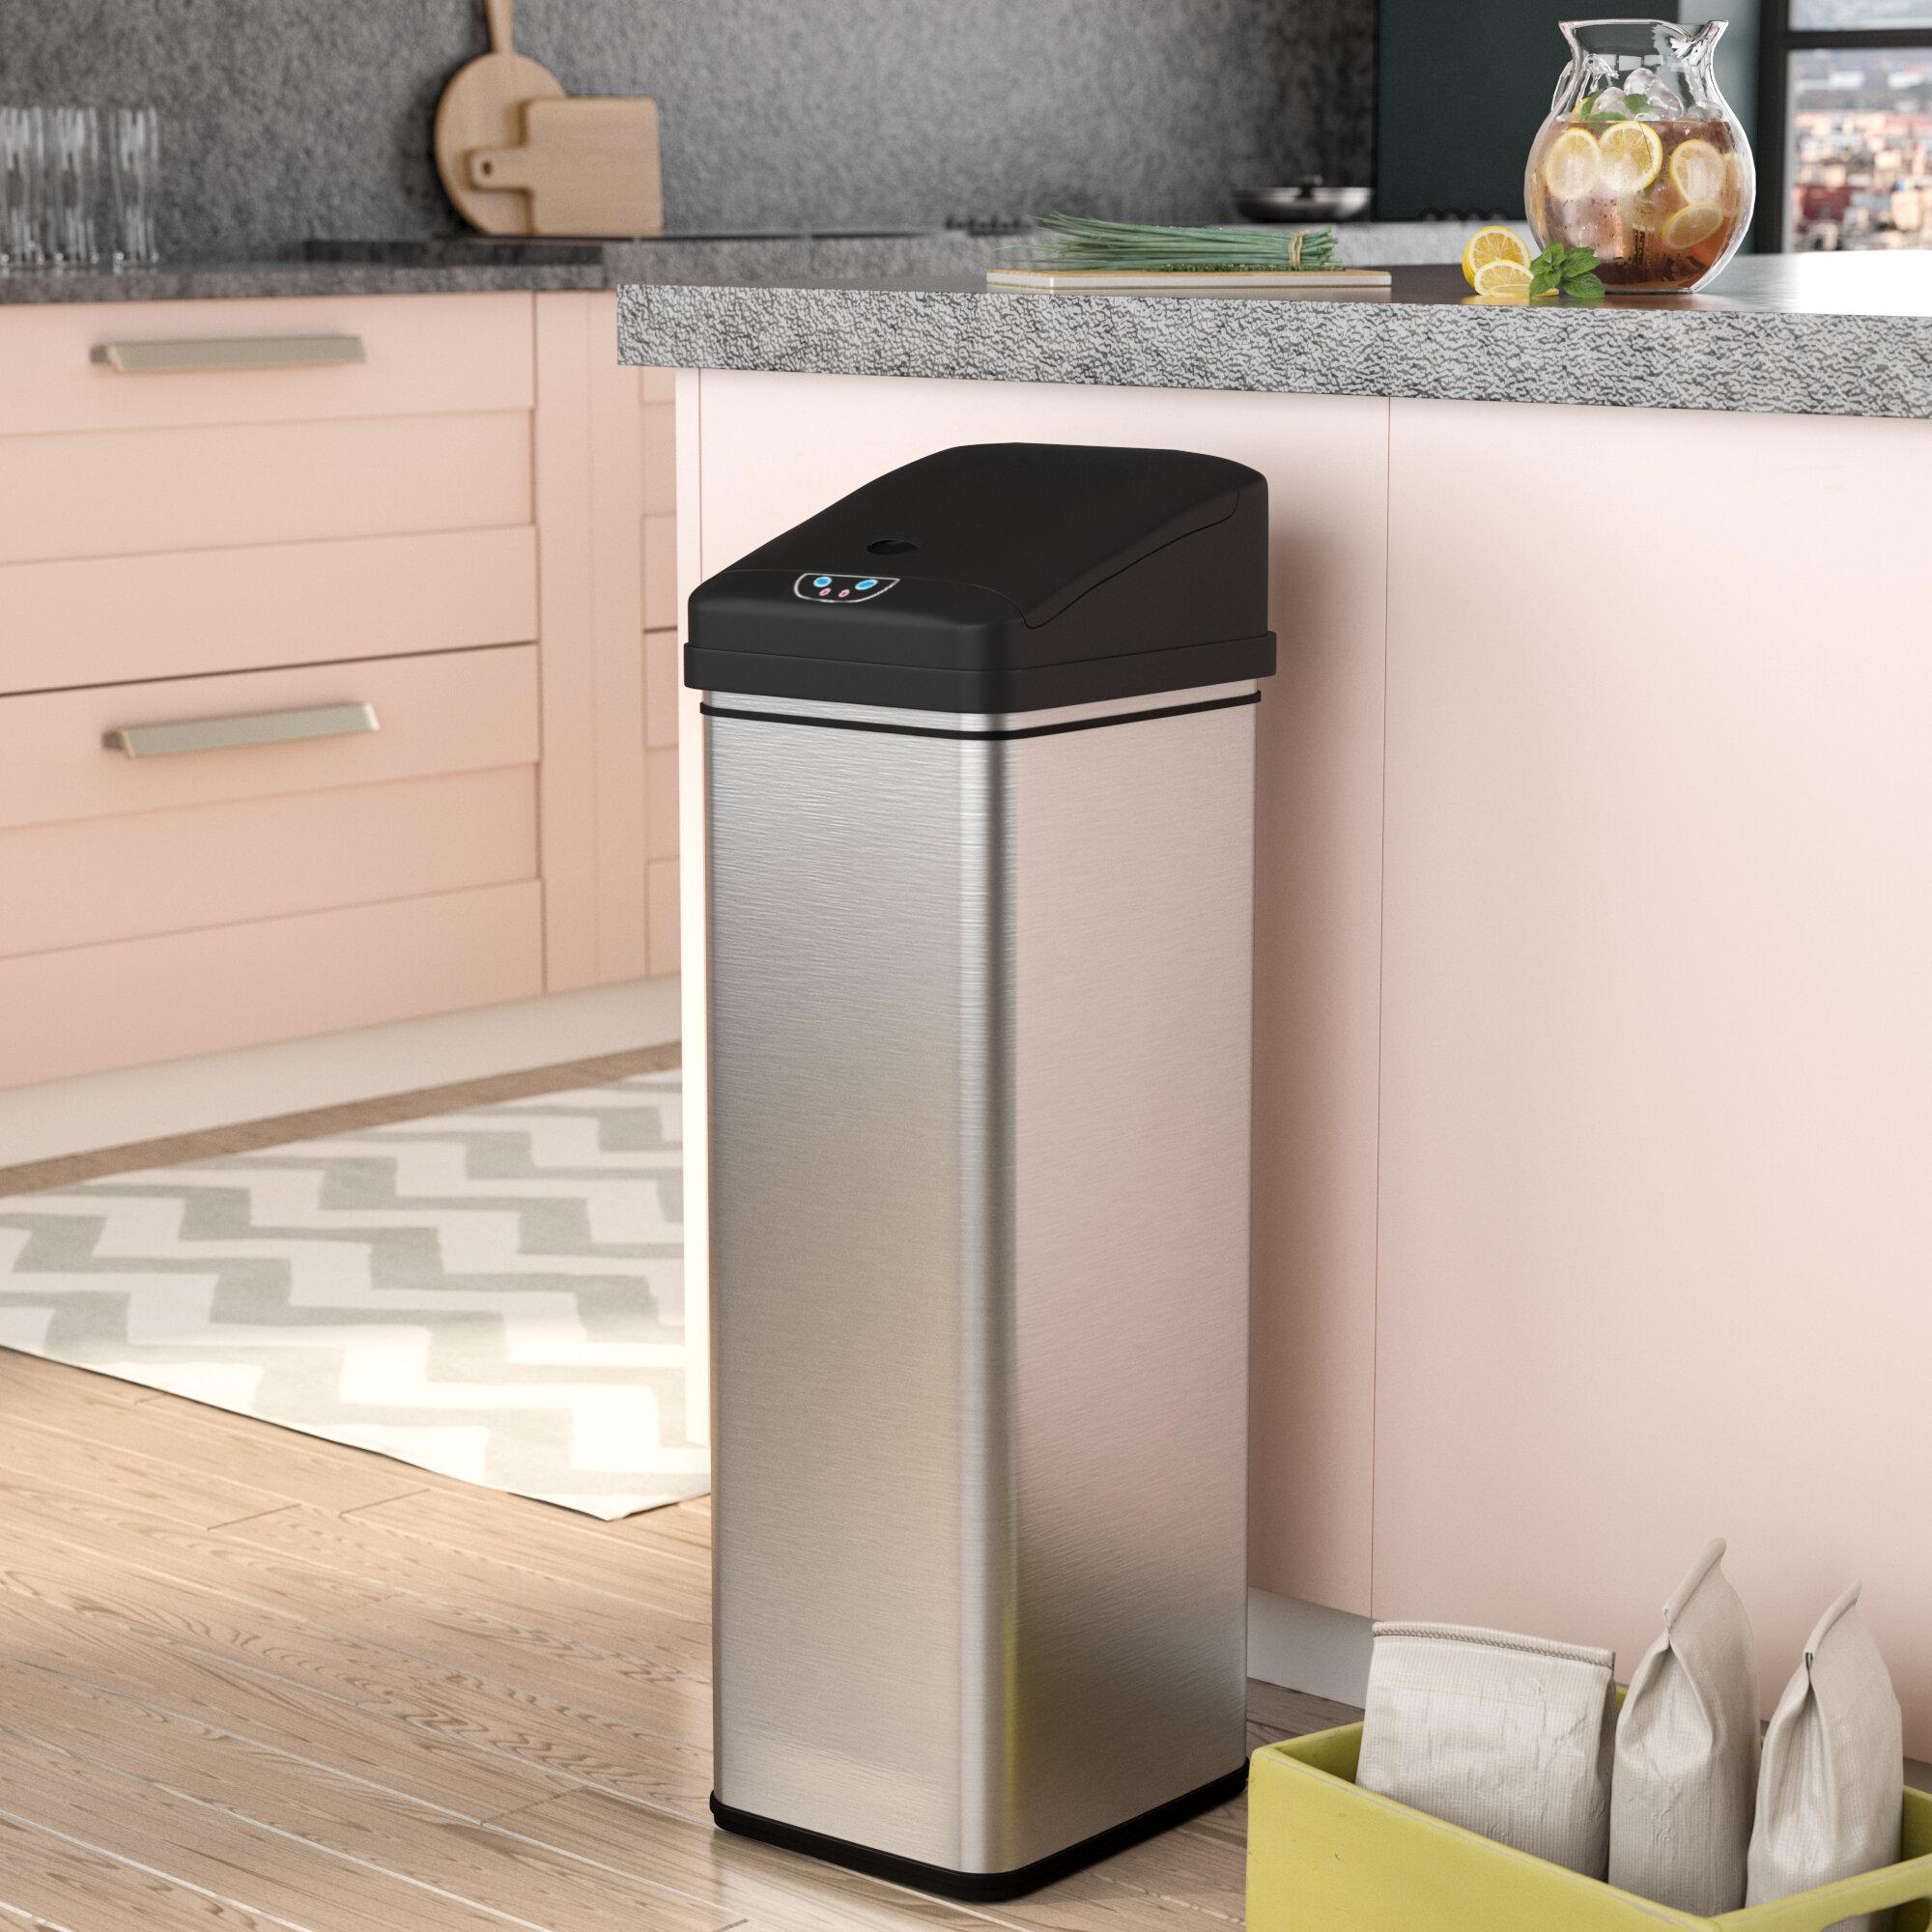 Ealy Stainless Steel 13 Gallon Motion Sensor Trash Can Reviews Allmodern